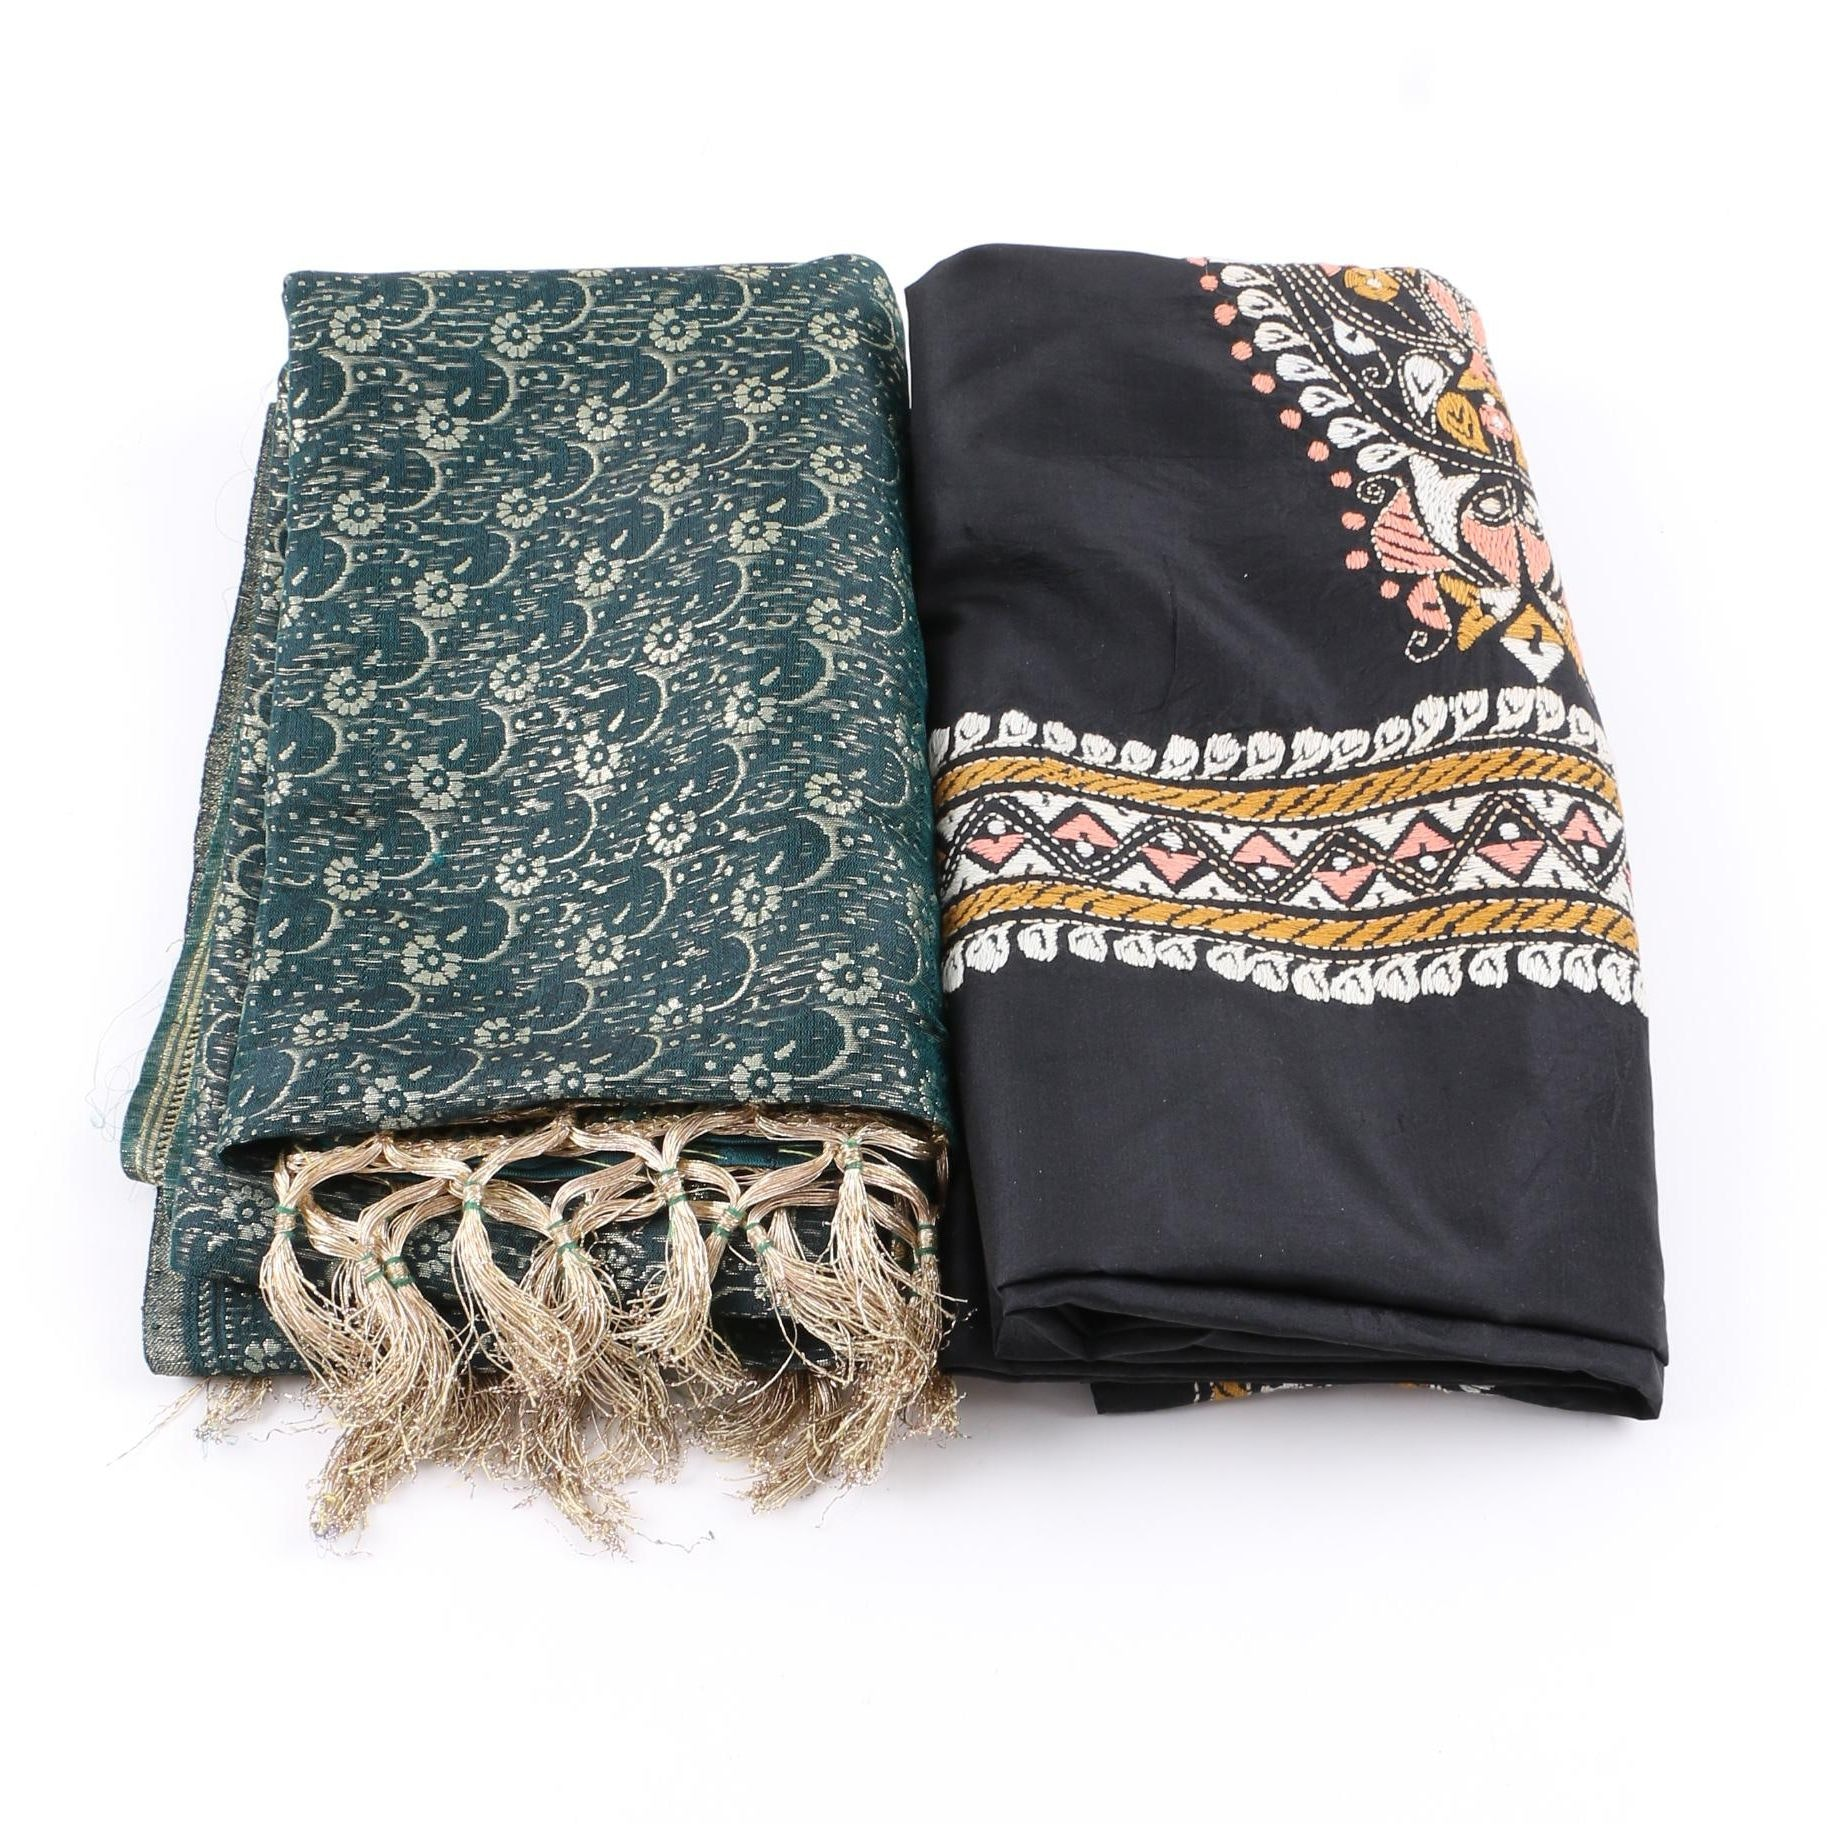 Colorful Scarves Including Embroidered Design